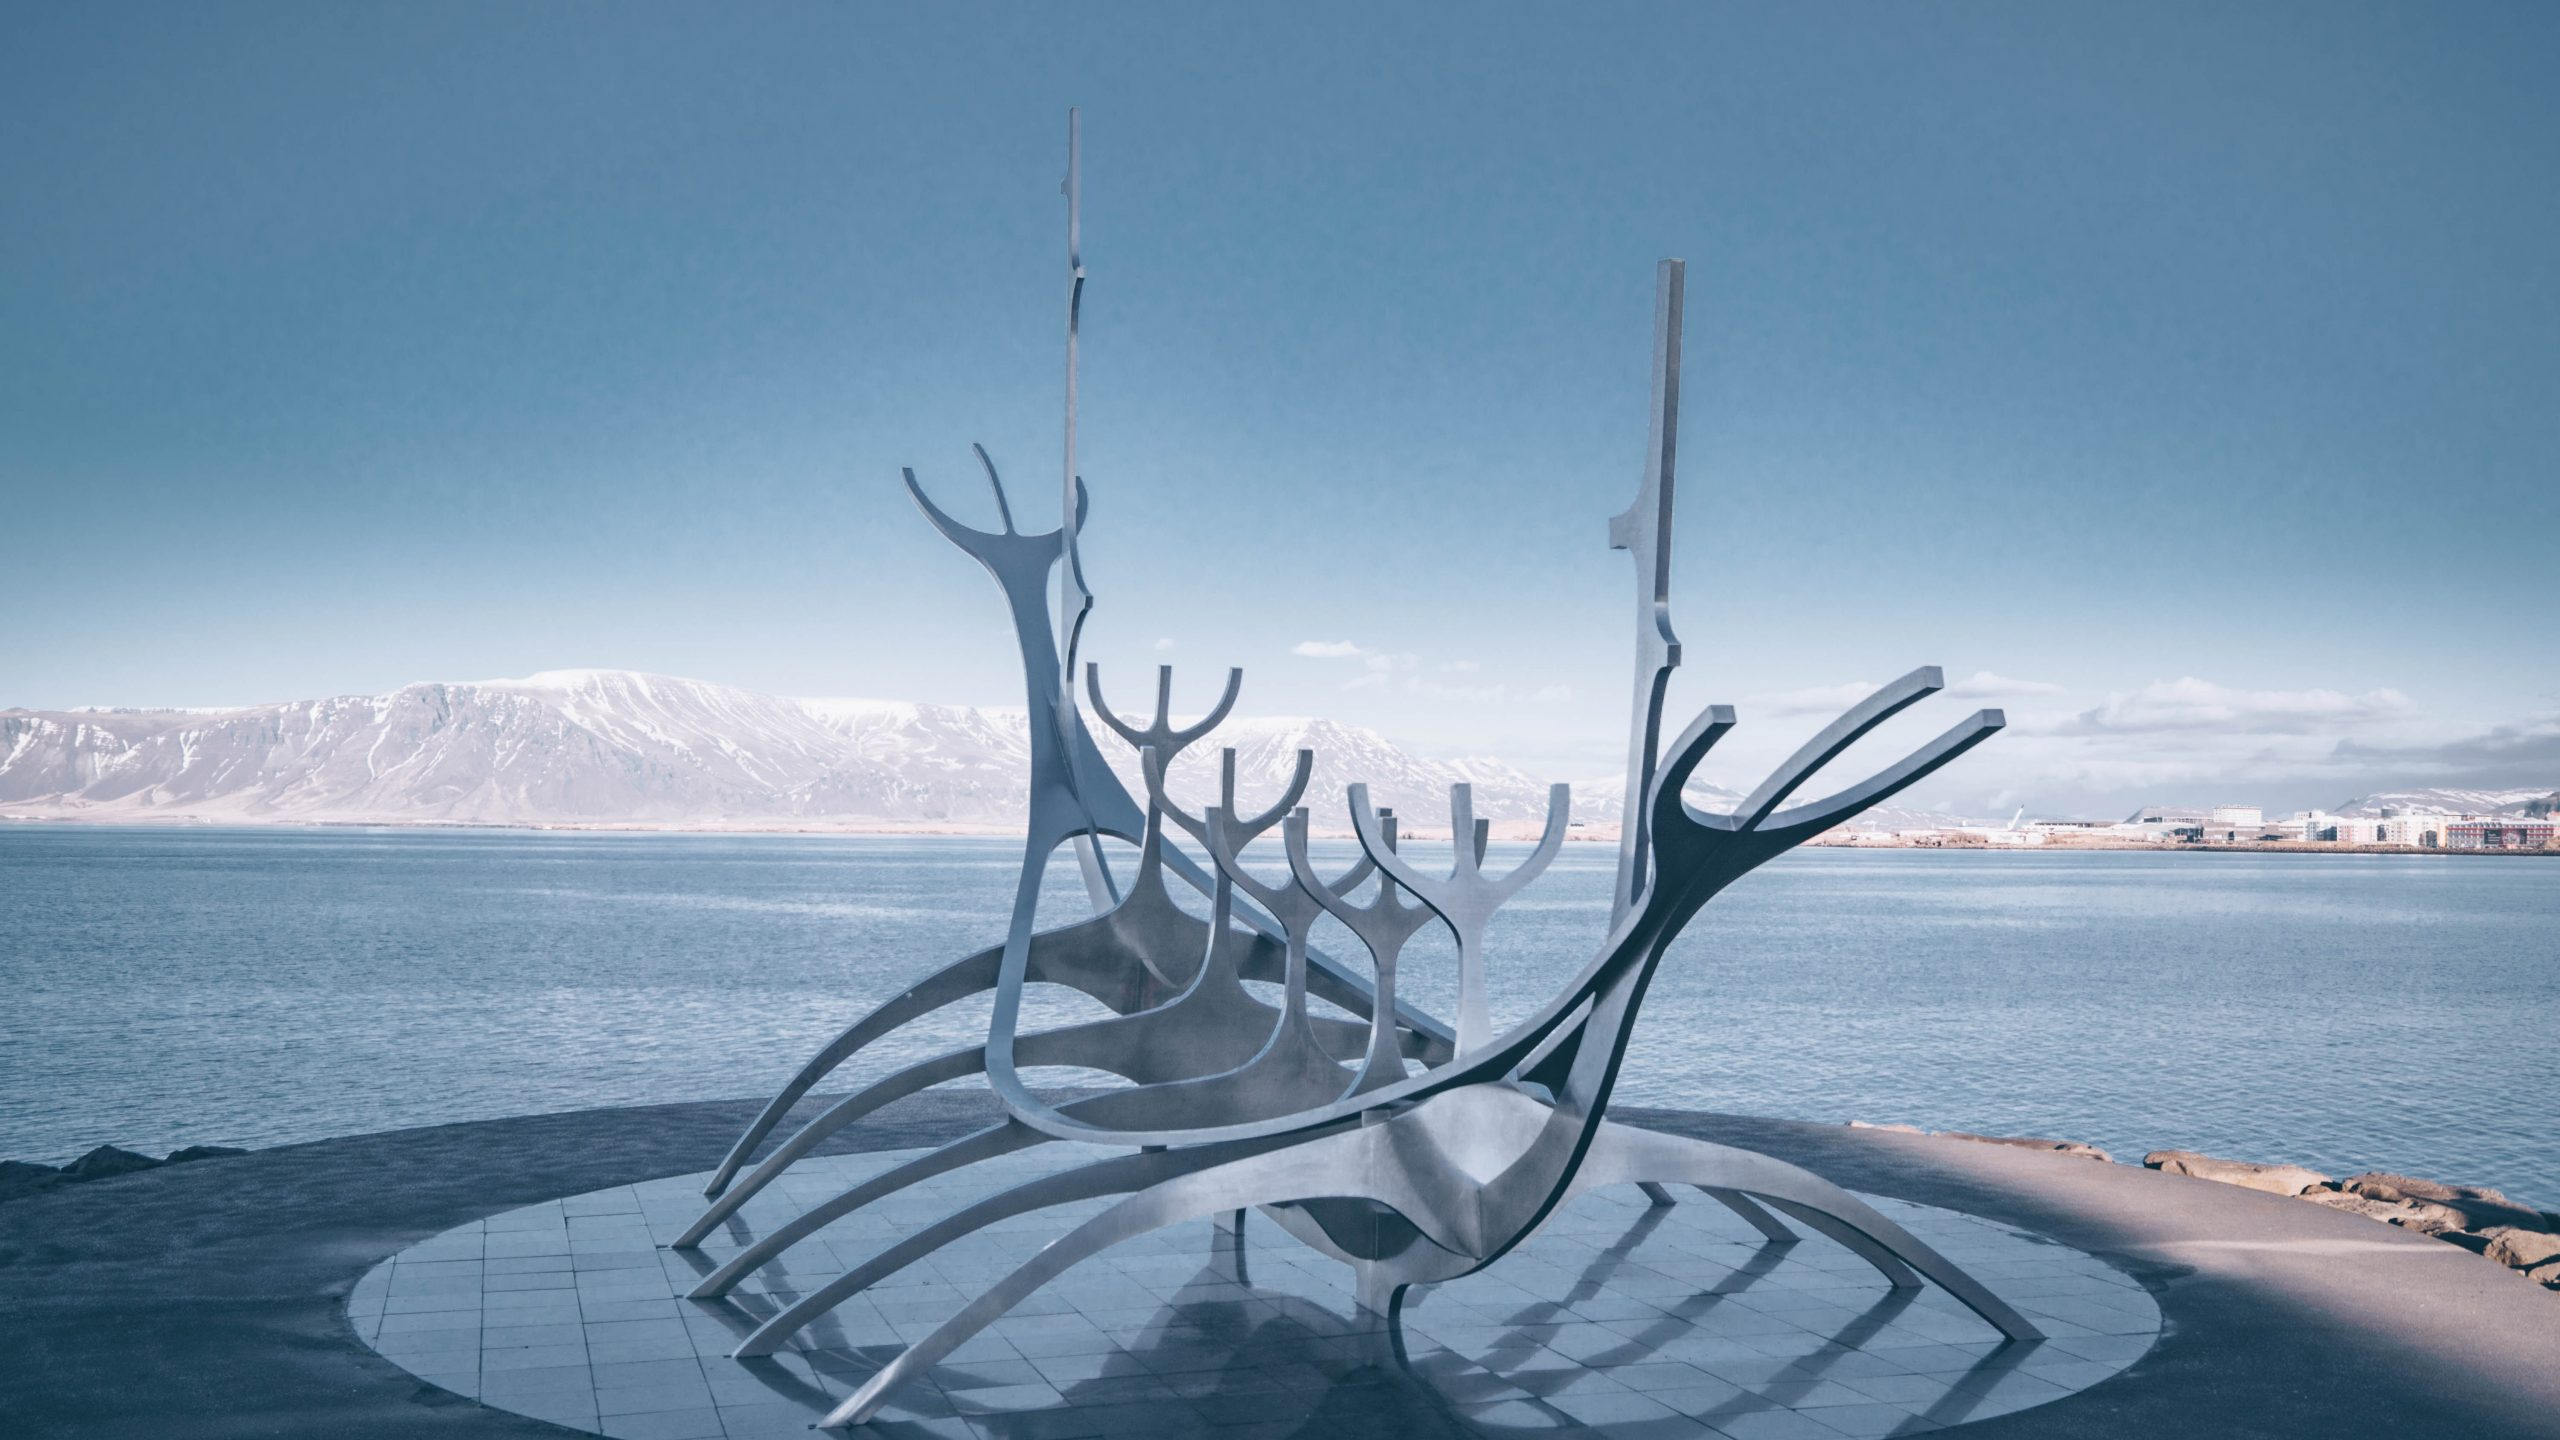 Reykjavik Sonnenfahrt